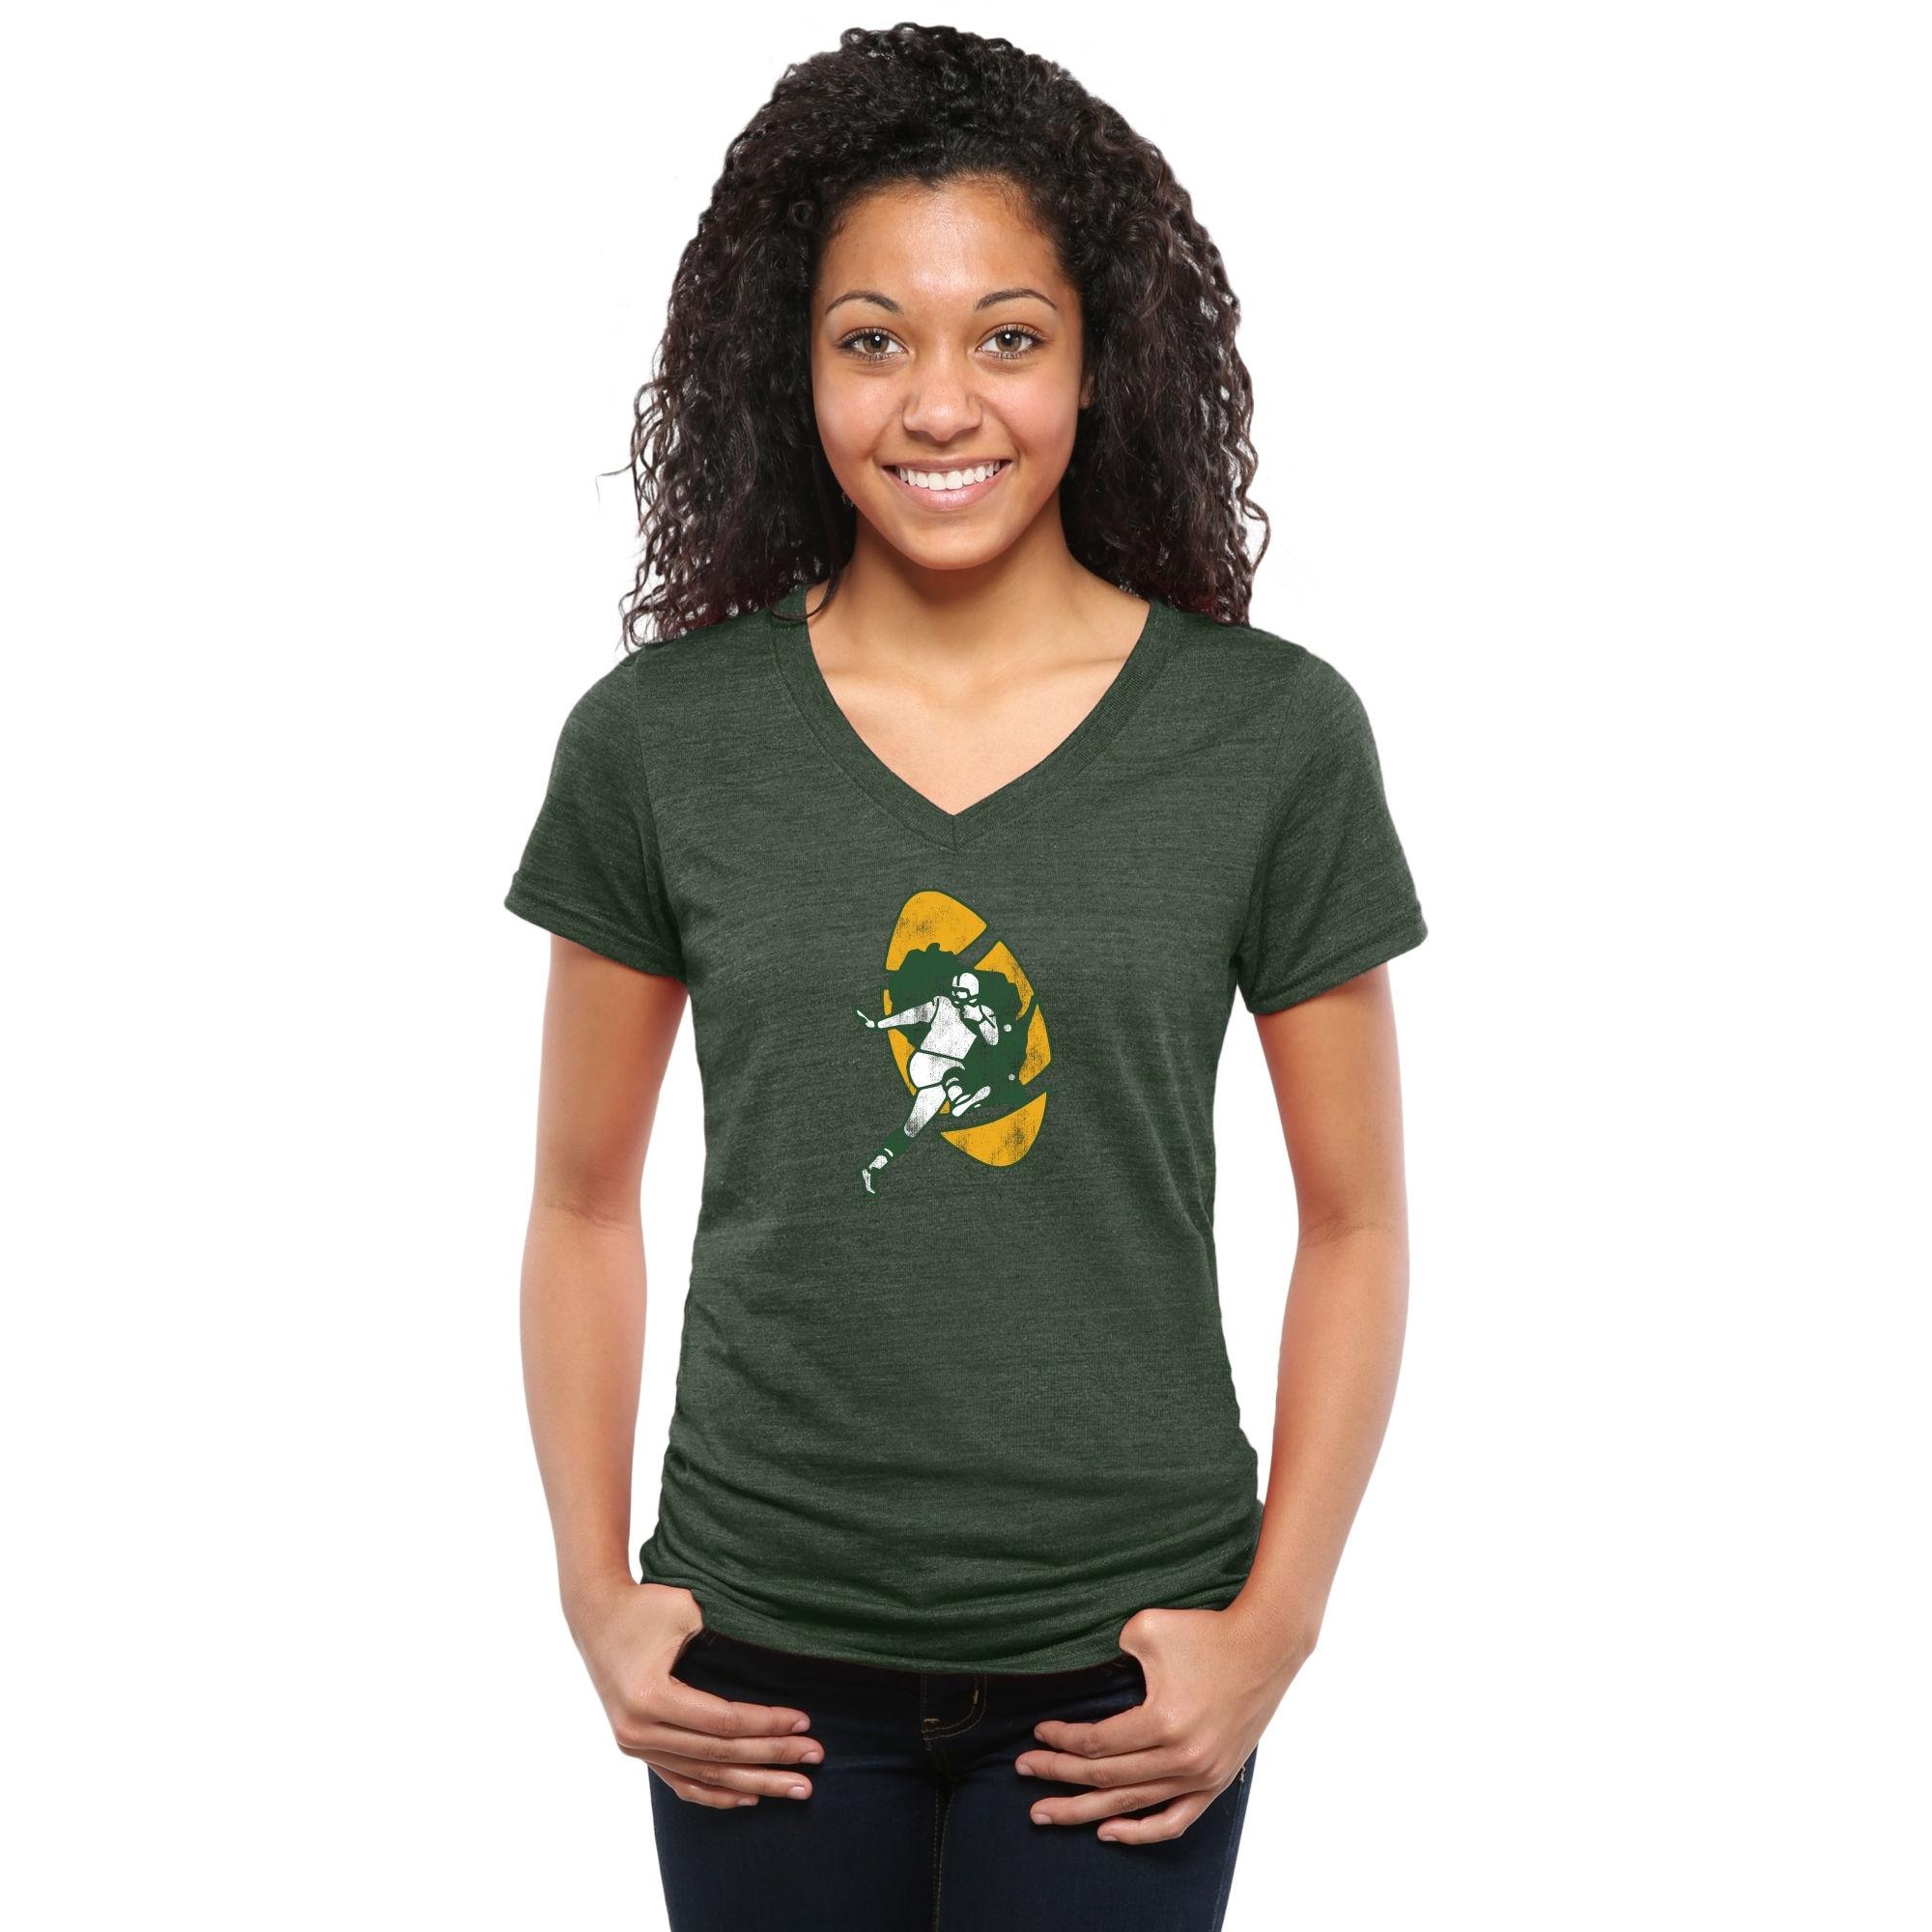 Green Bay Packers NFL Pro Line Women's Throwback Logo Tri-Blend V-Neck T-Shirt - Green